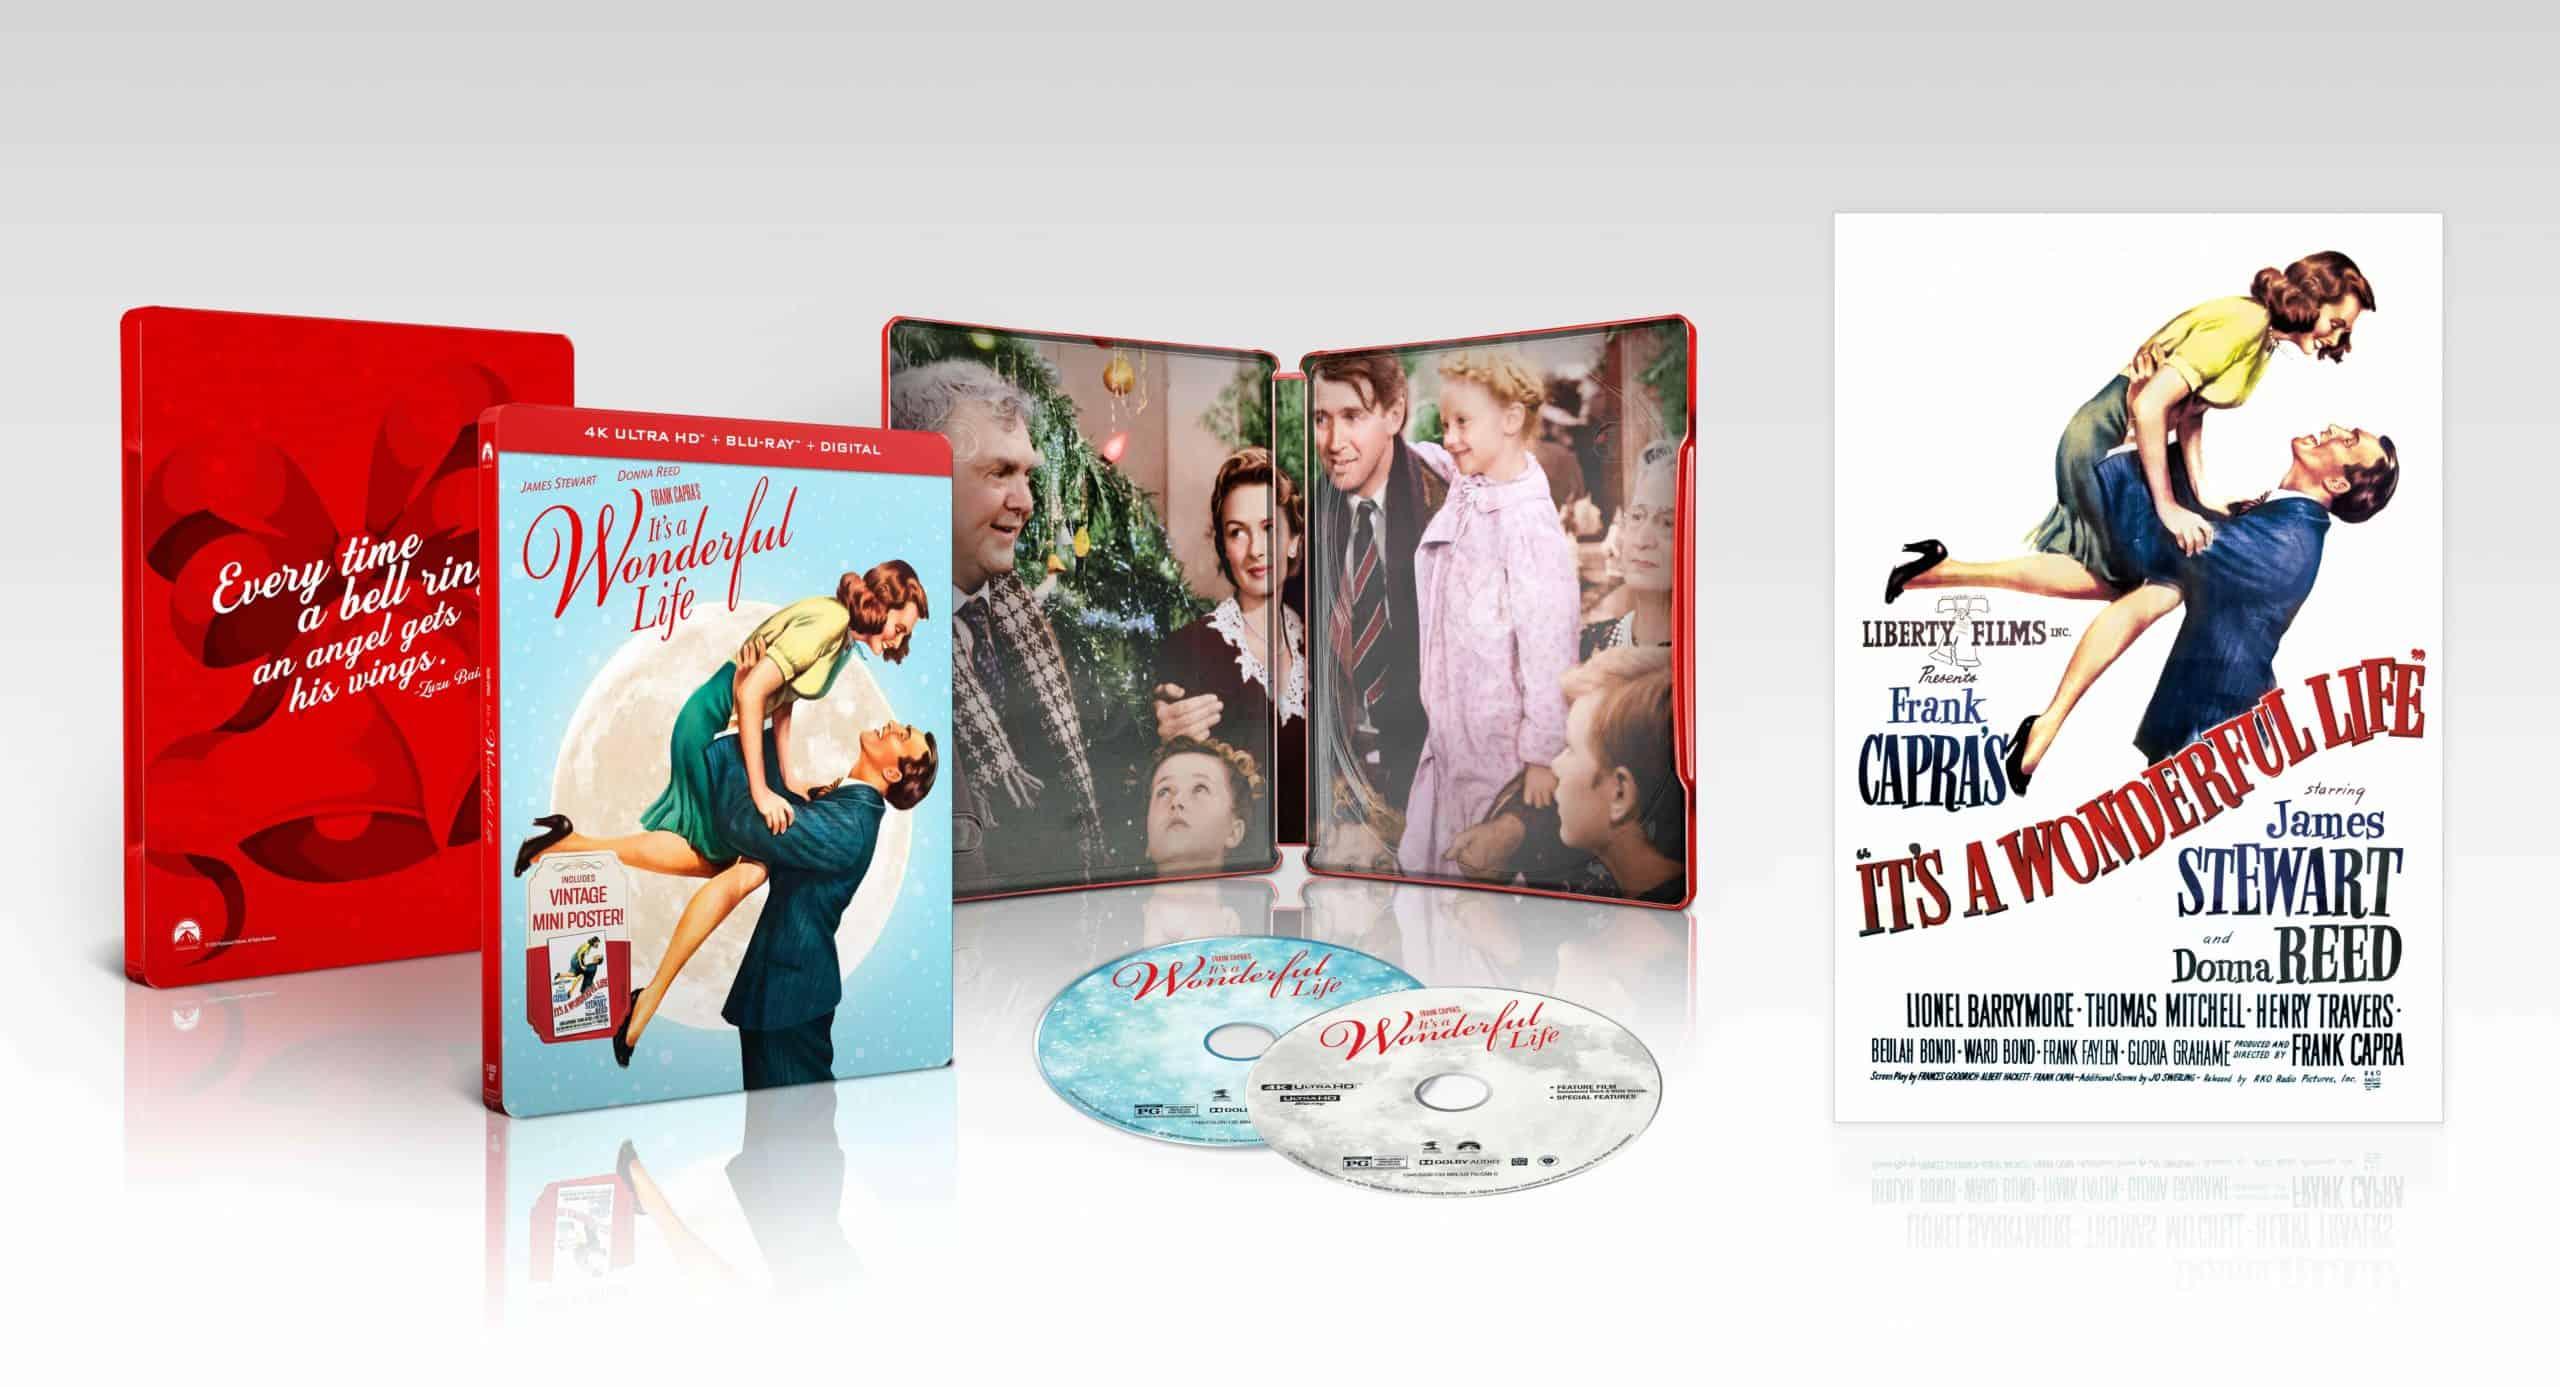 It's a Wonderful Life 4K Blu-ray steelbook